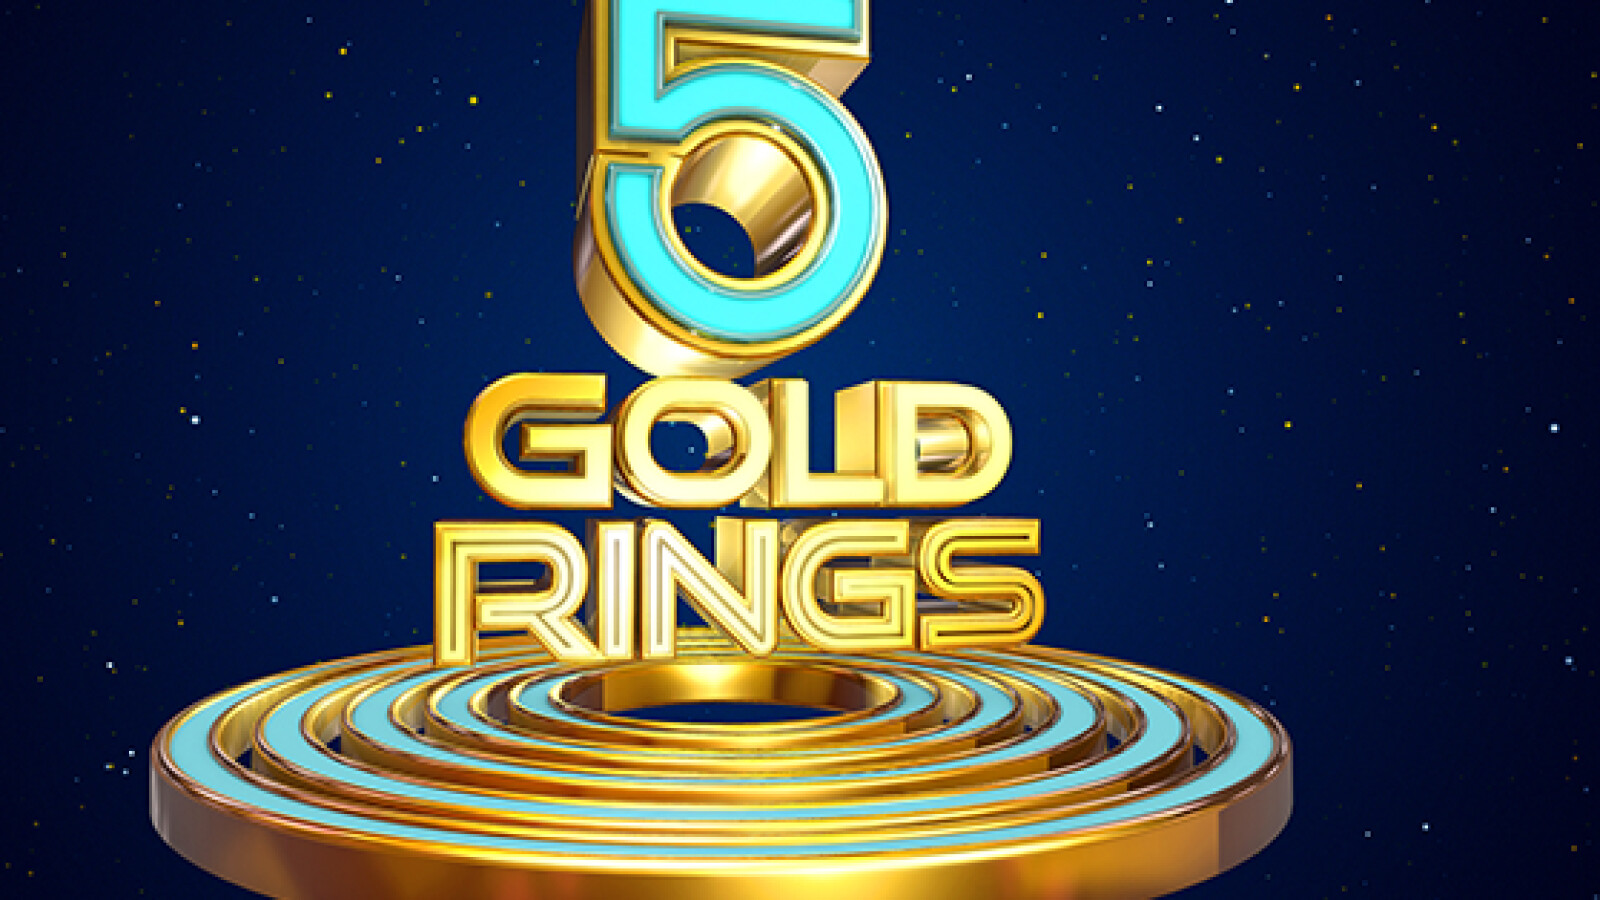 Tv Sat 1 Gold